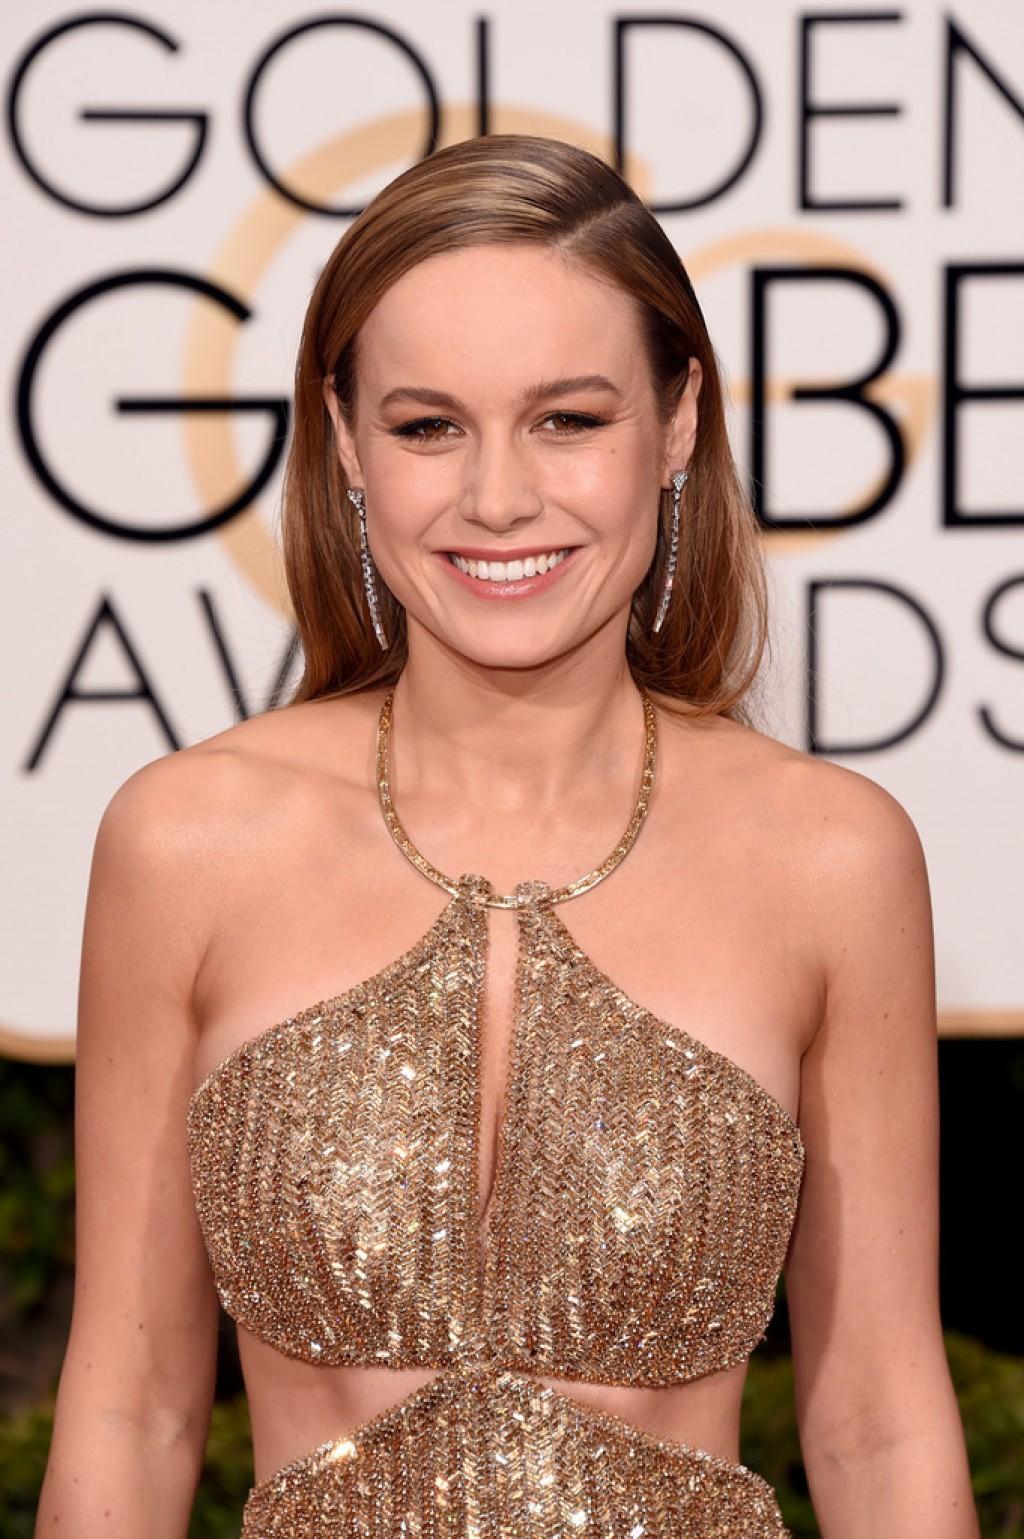 Brie-Larson-2016-Golden-Globe-Awards-3-1024x1539